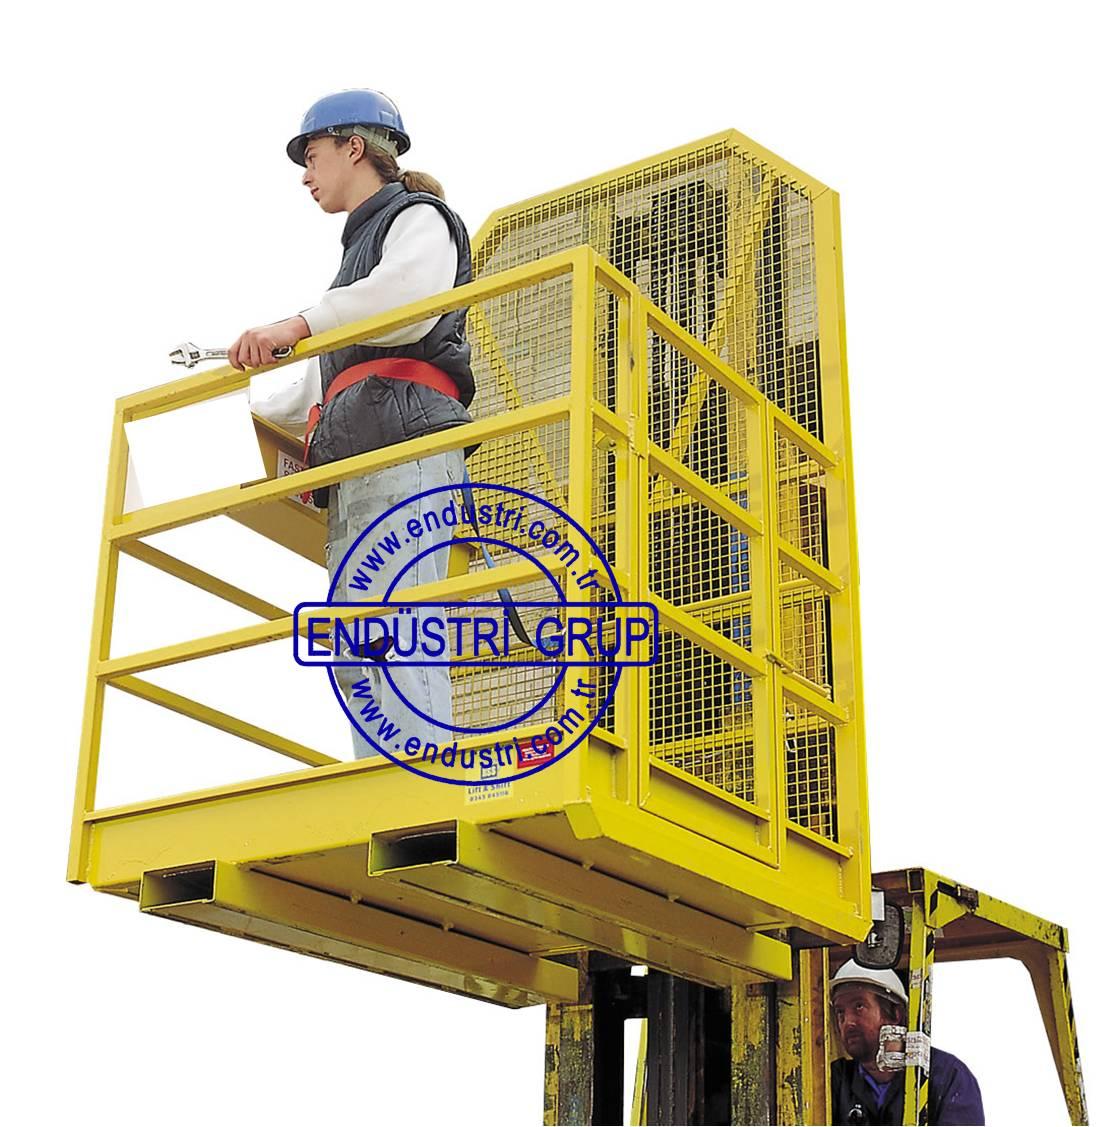 forklift-insan-tasima-sepeti-calisma-bakim-tamir-platformu-forklift-sepetleri-imalati-fiyati-cesitleri (32)